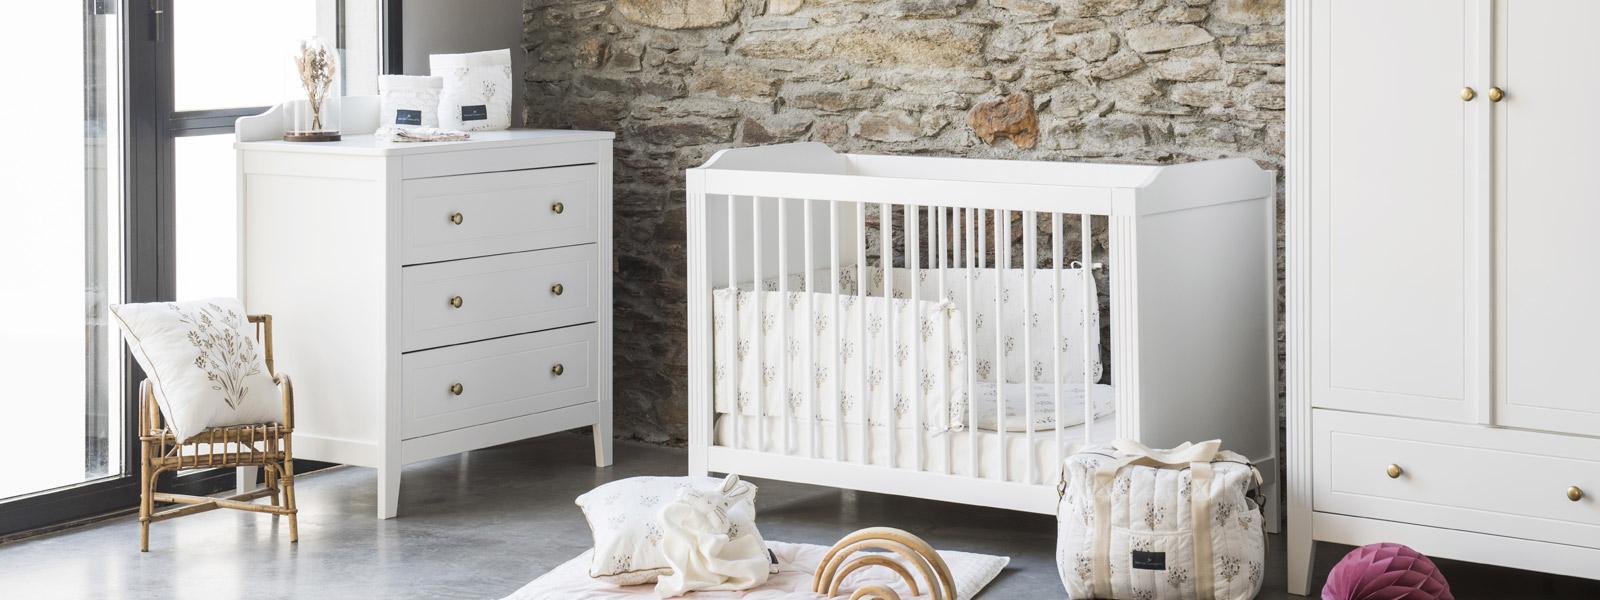 mobilier-blanc-chambre-bebe-maison-charlotte